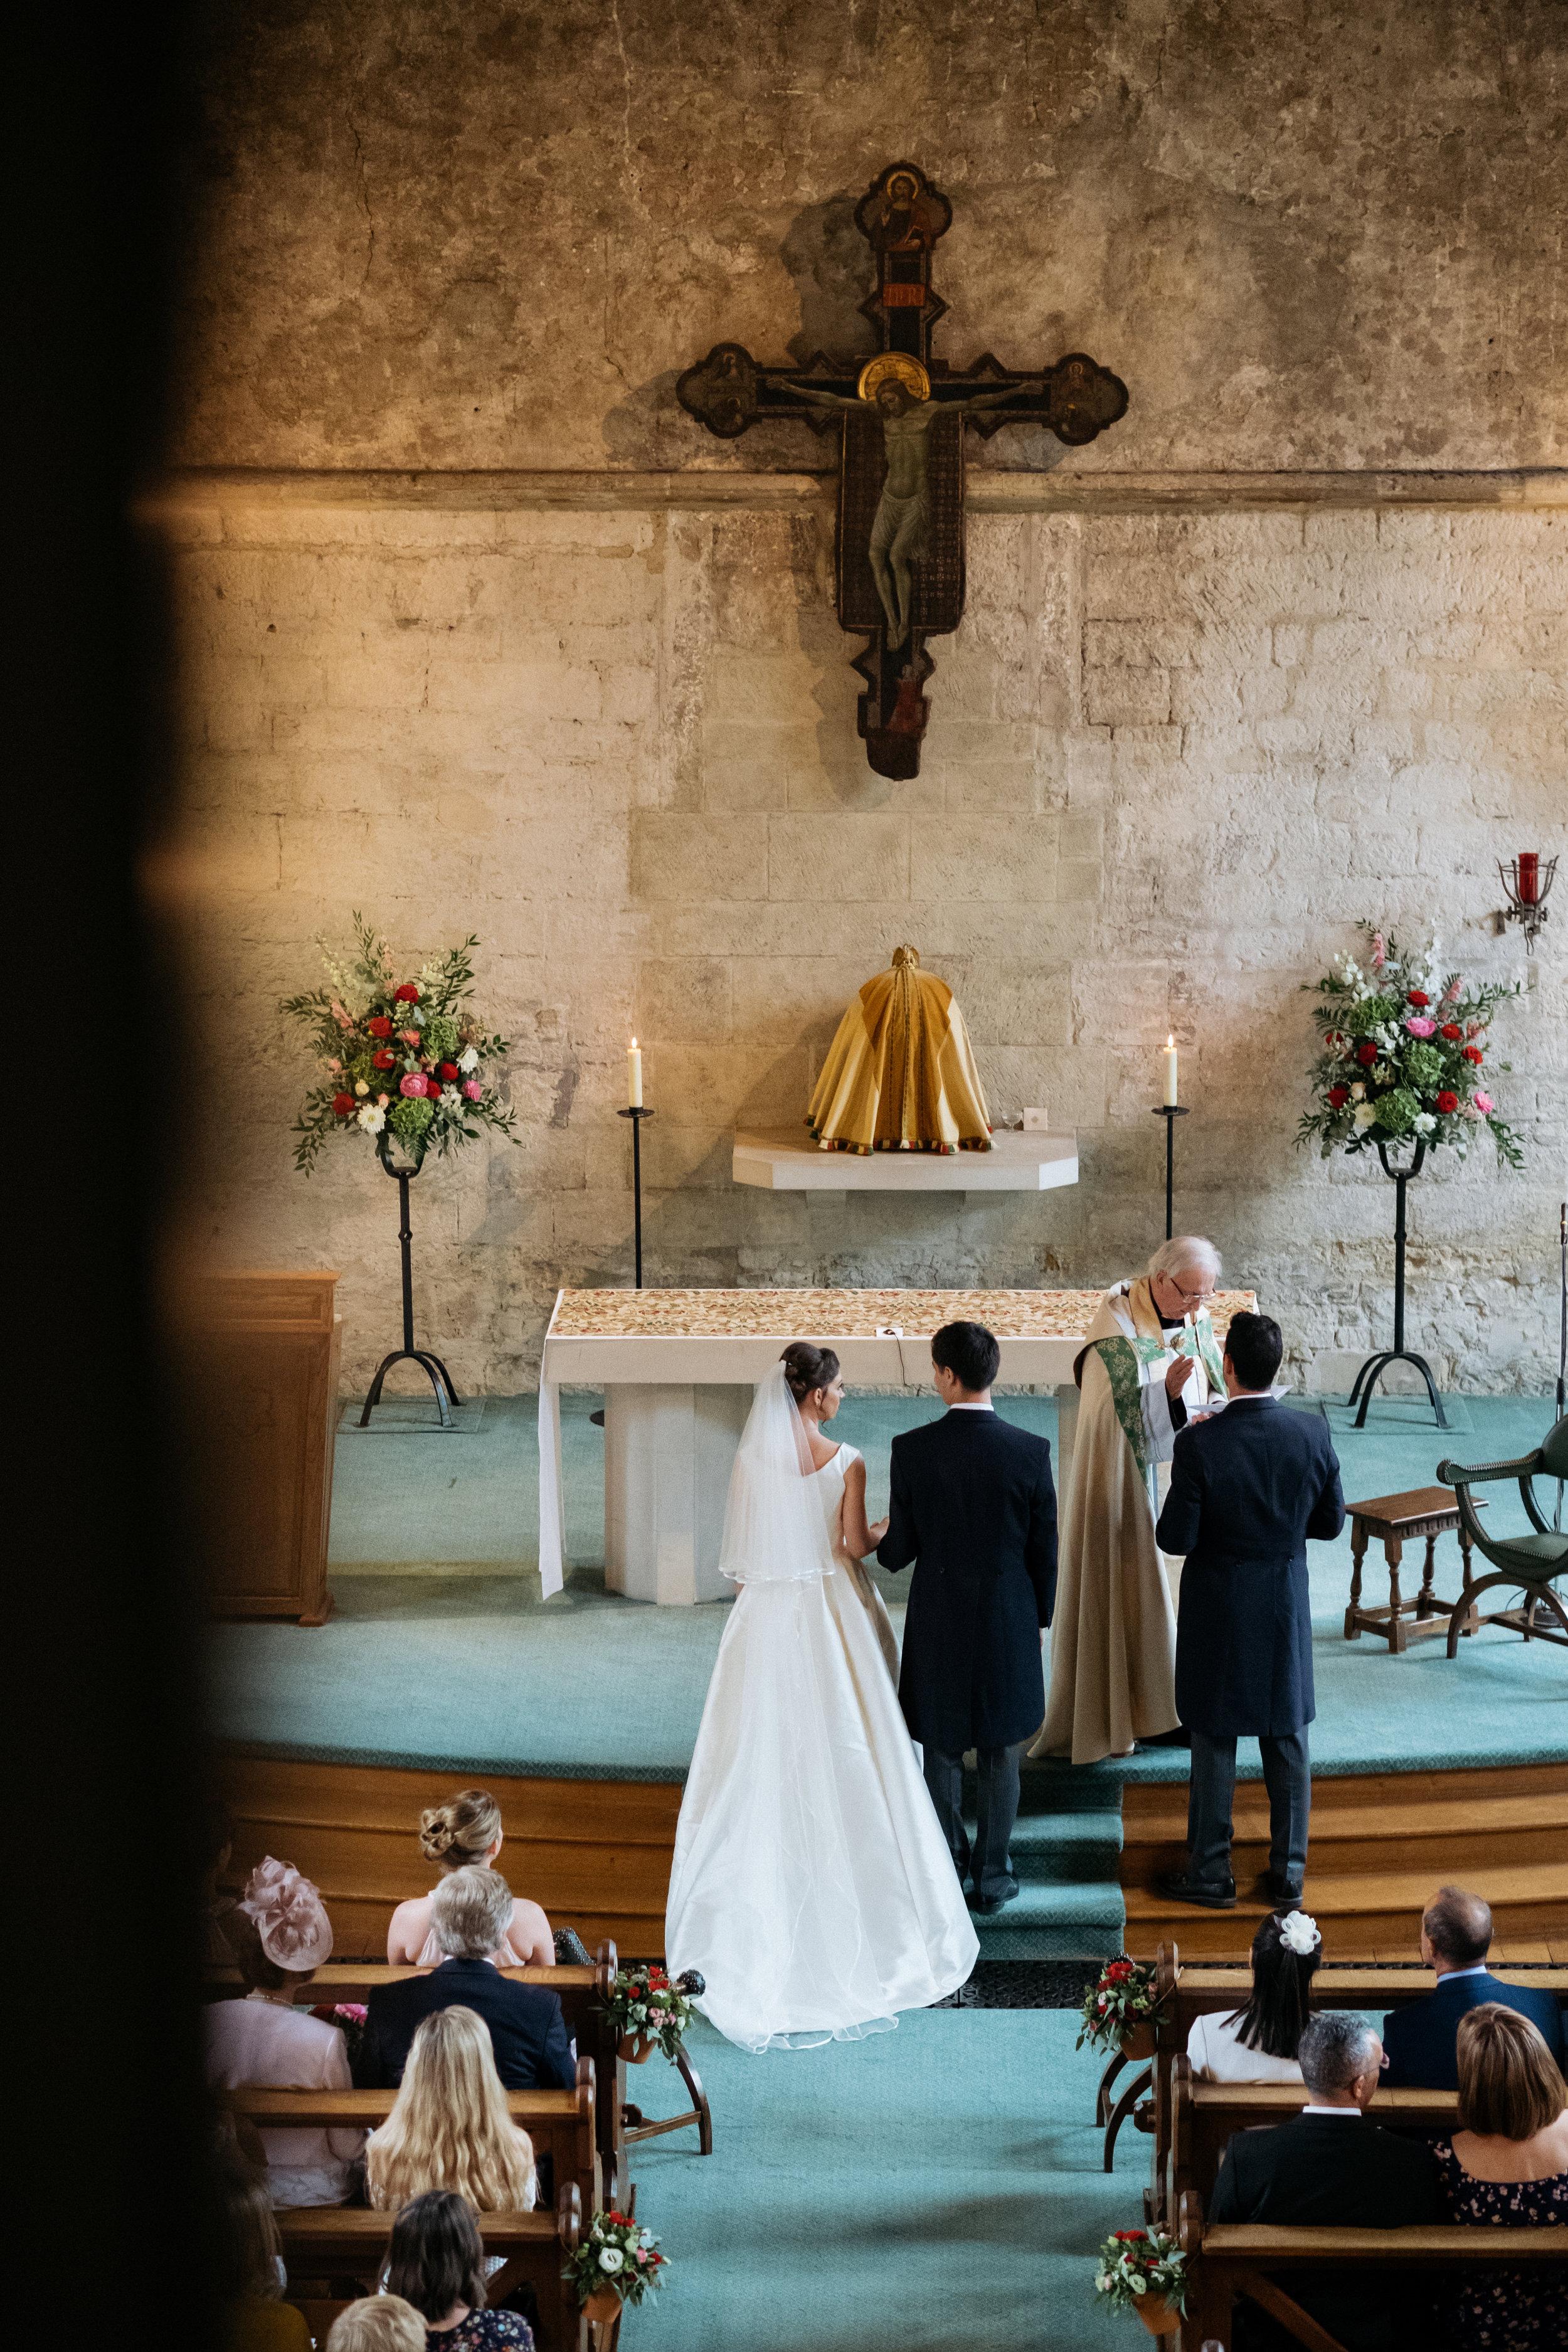 Bride and groom at chapel wedding